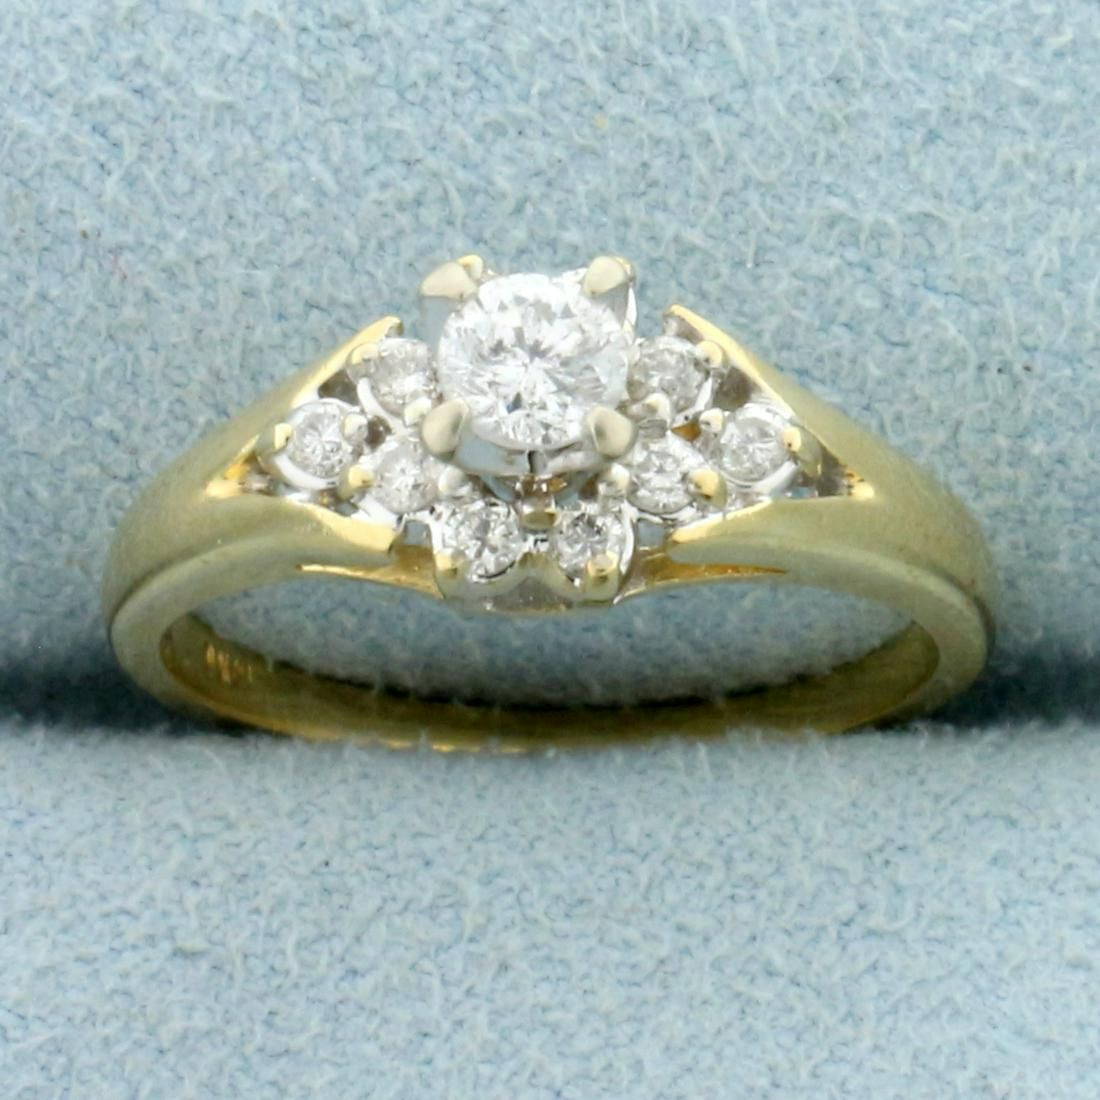 Vintage 1/3ct TW Diamond Ring in 14K Yellow Gold